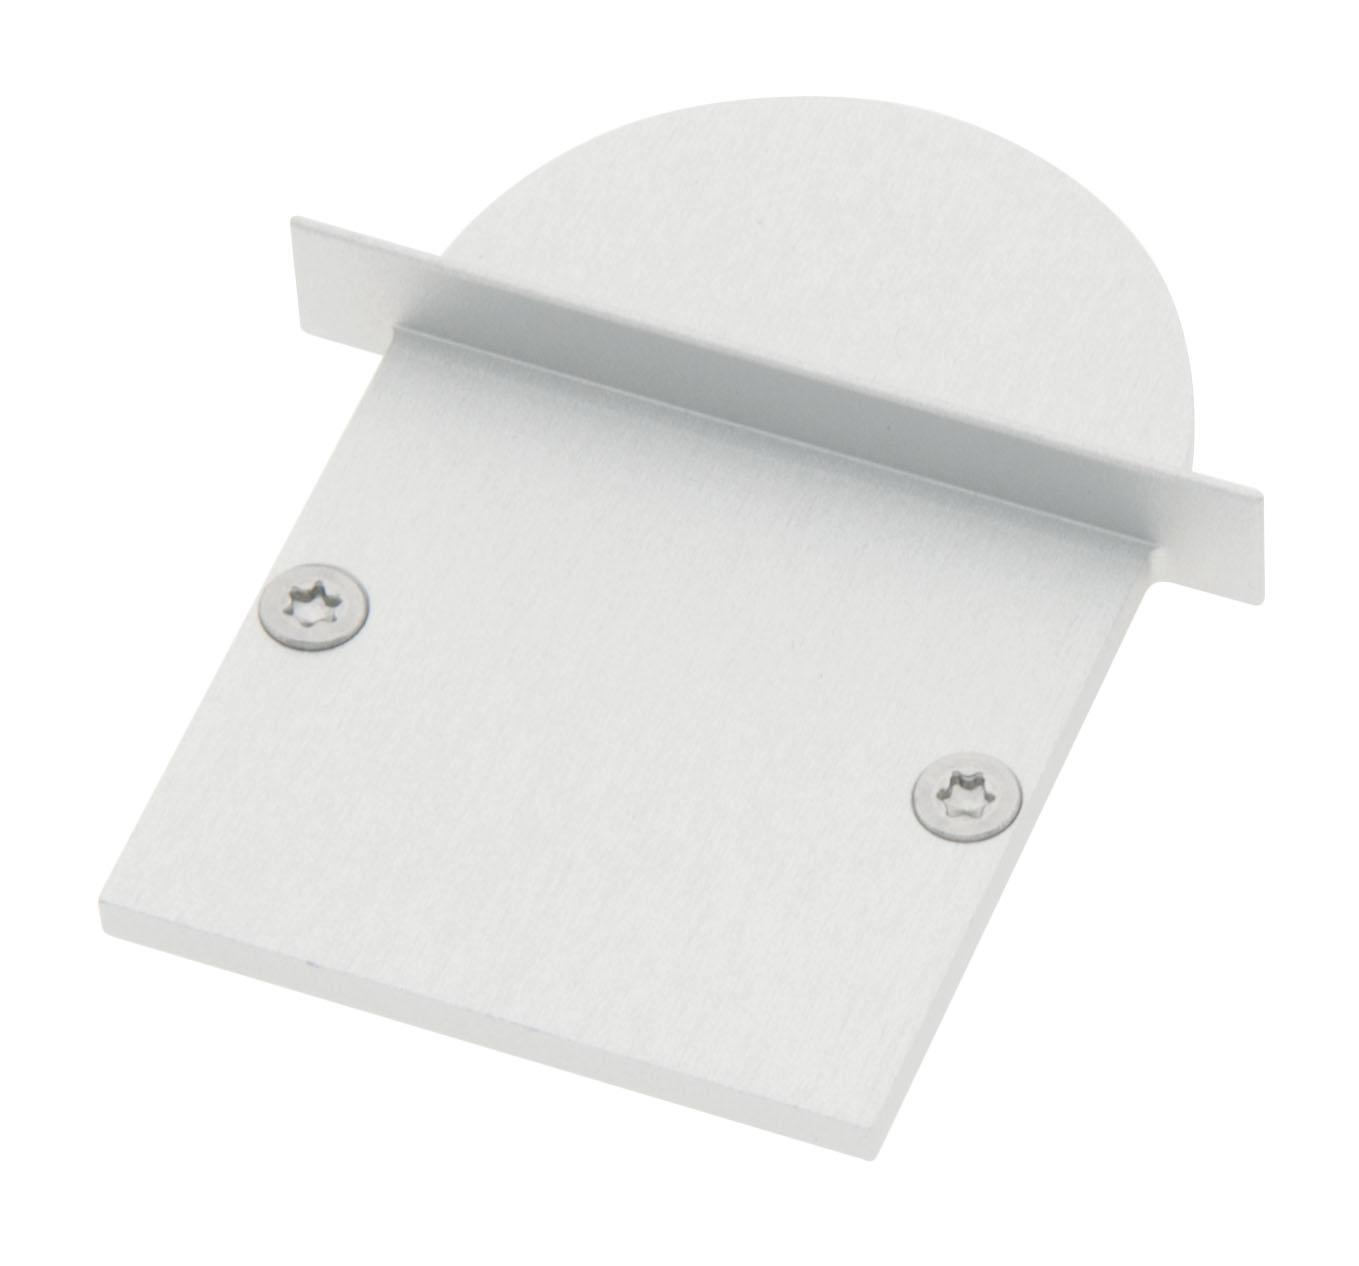 1 Stk Profil Endkappe CLI Rund geschlossen inkl. Schrauben LIEK006310